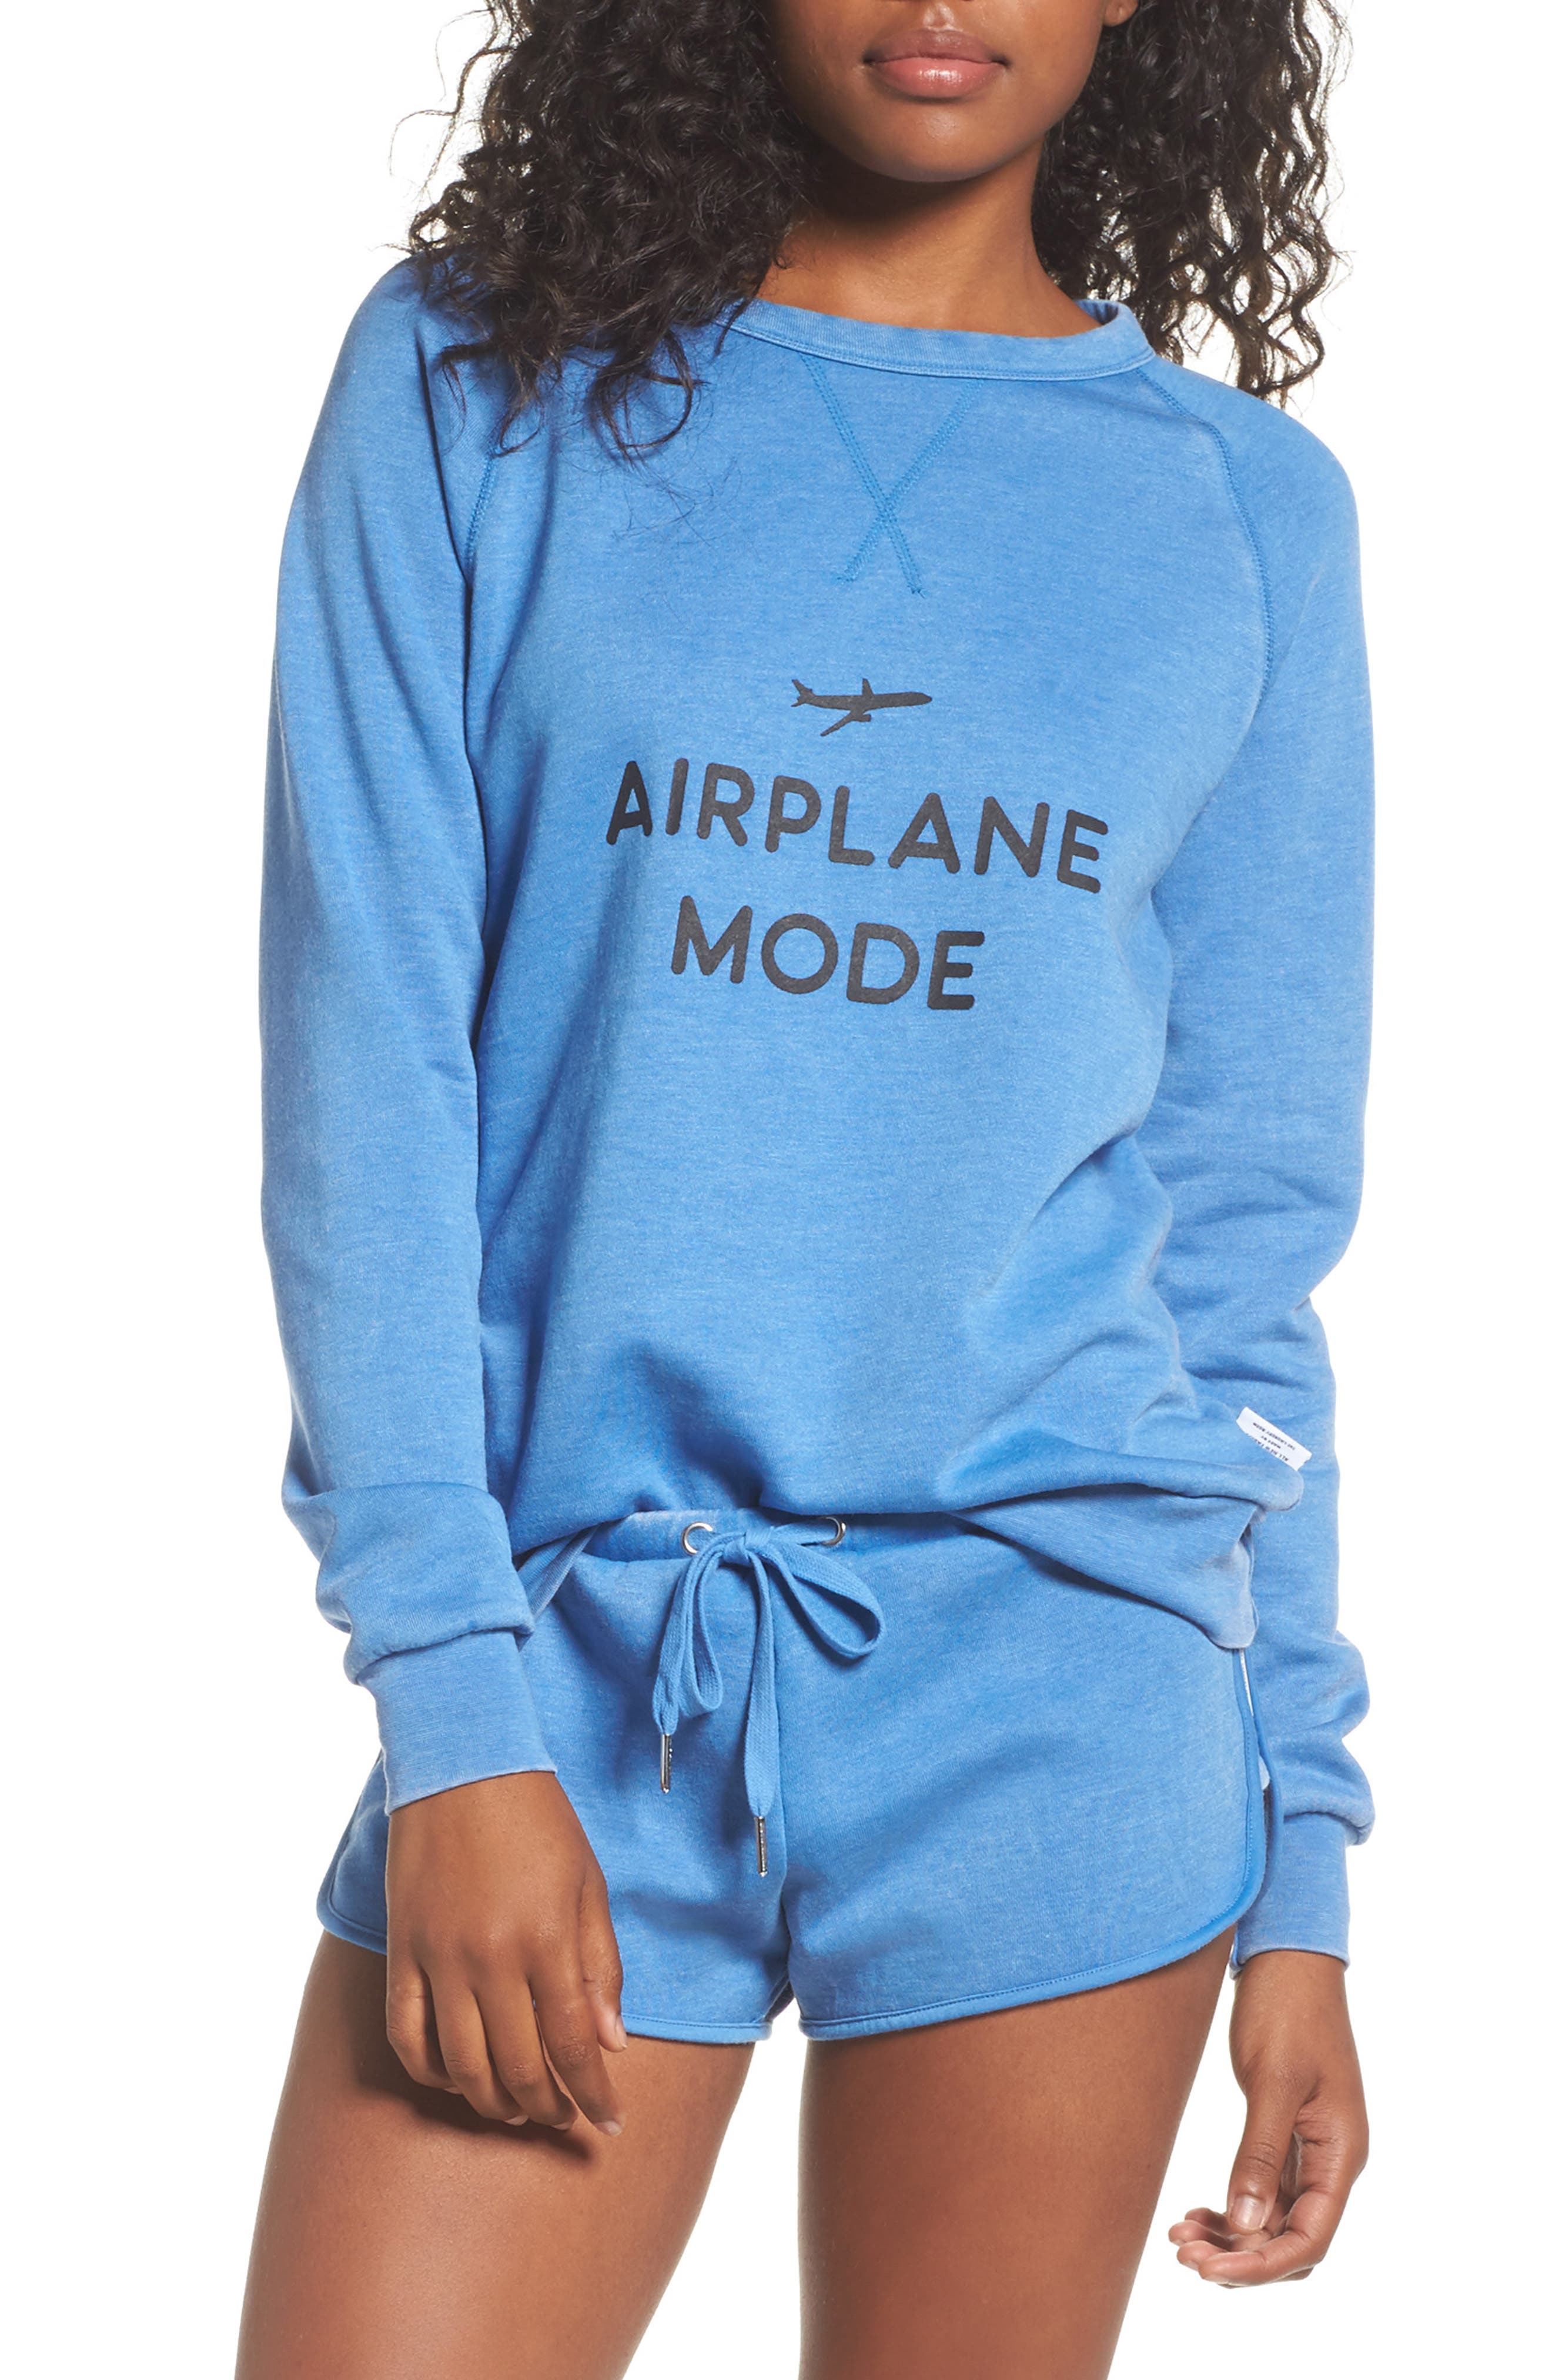 Alternate Image 1 Selected - The Laundry Room Airplane Mode Cozy Lounge Sweatshirt